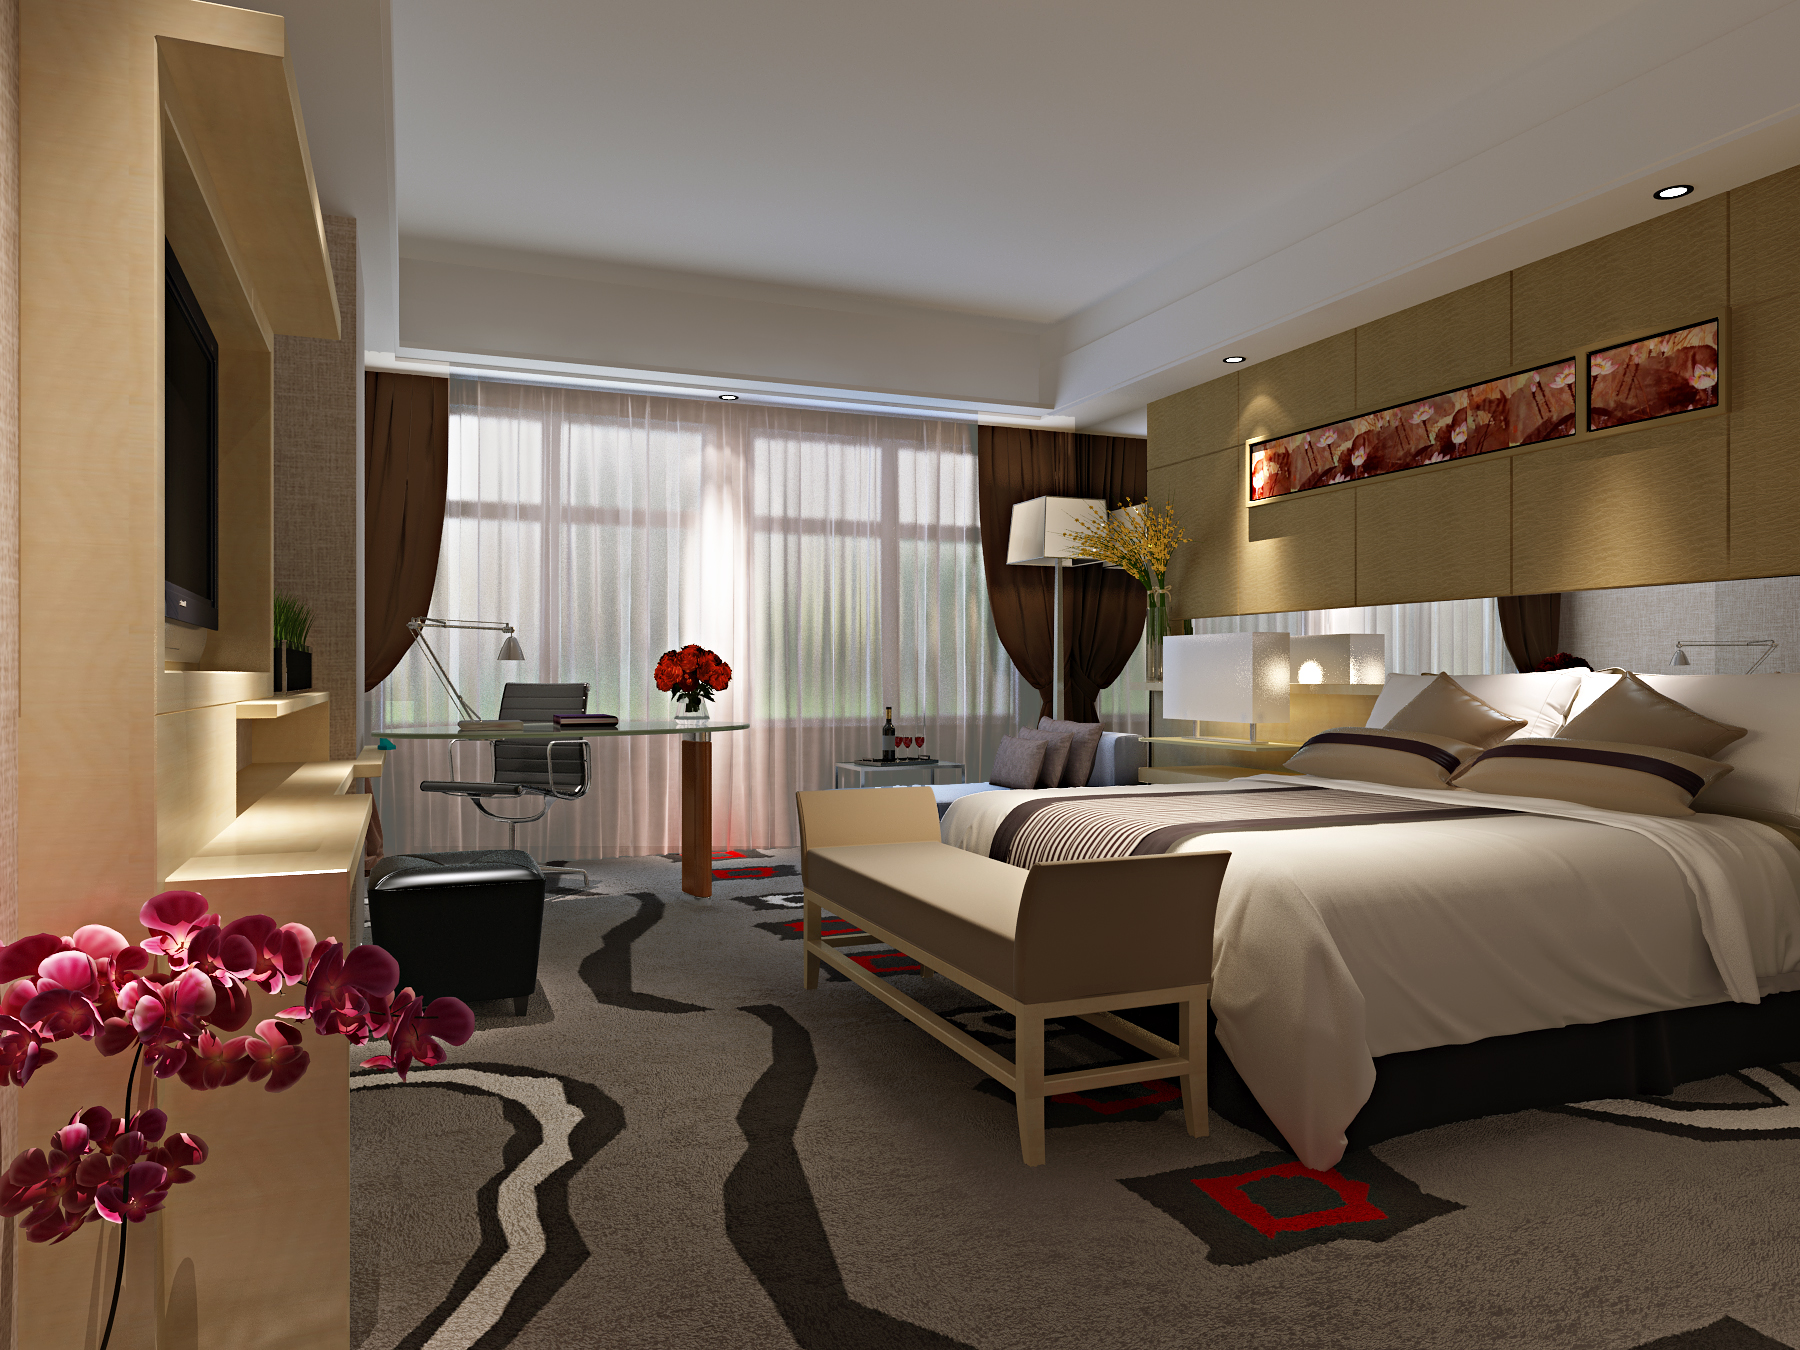 Model Bedroom modern bedroom 3d model max